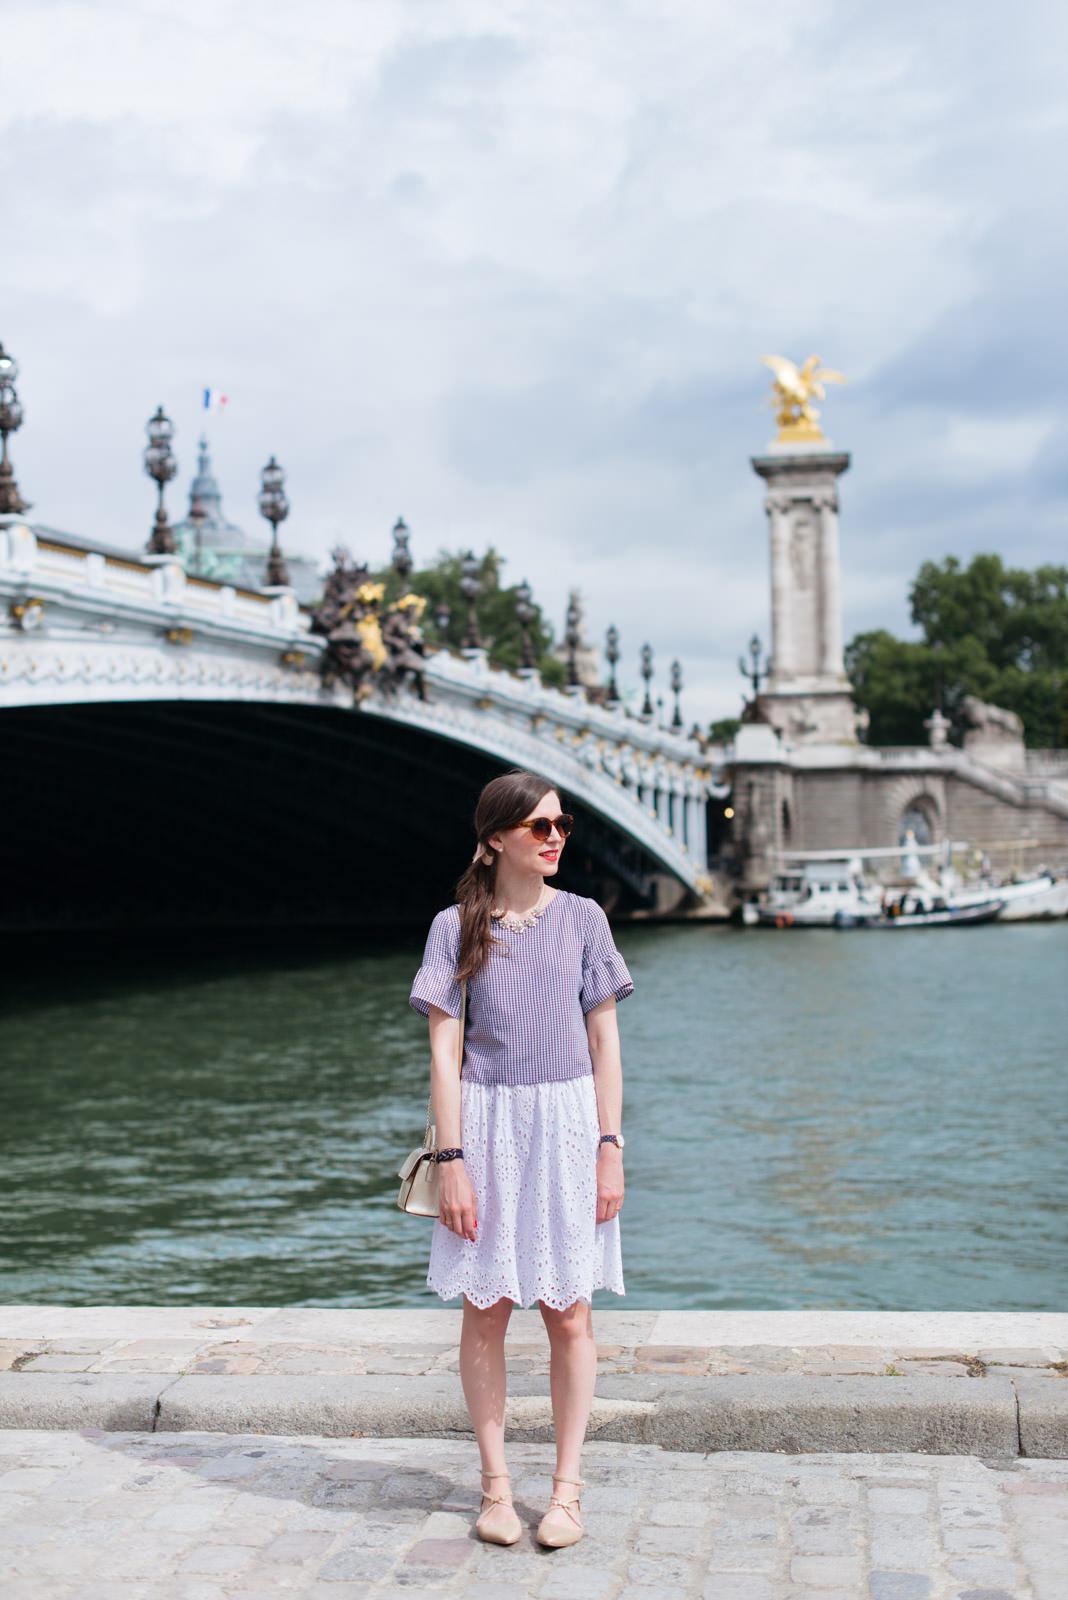 Blog-Modea-And-The-City-Looks-Sous-Le-Pont-Alexandre-III